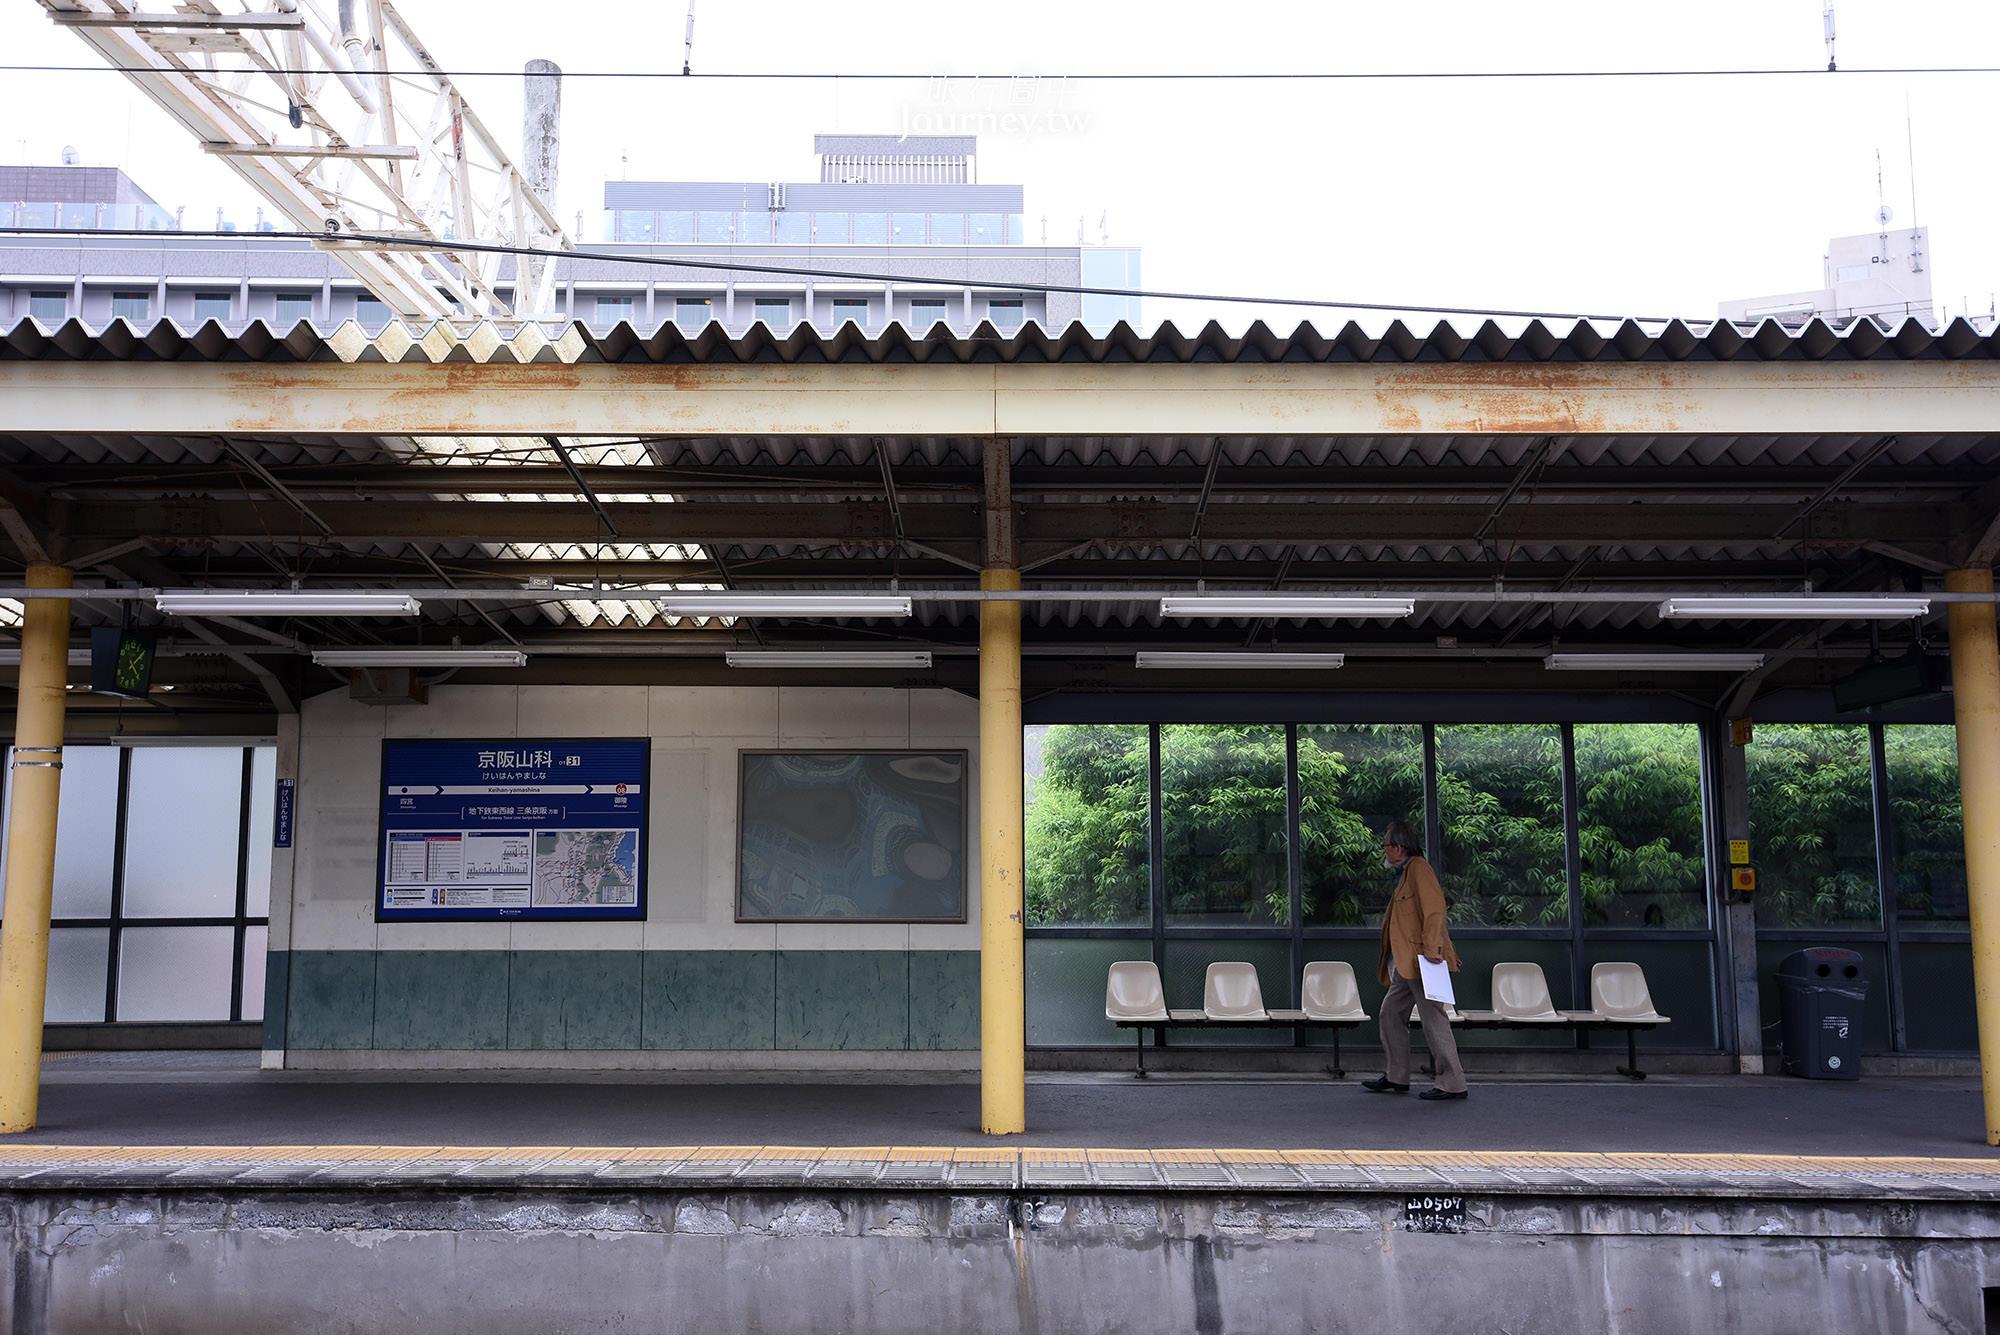 Japan 日本, kyoto 京都, Shiga 滋賀, 日本鐵道旅行, Kansai 關西, Otsu 大津, 路面電車, 京阪電車, 京都地下鐵